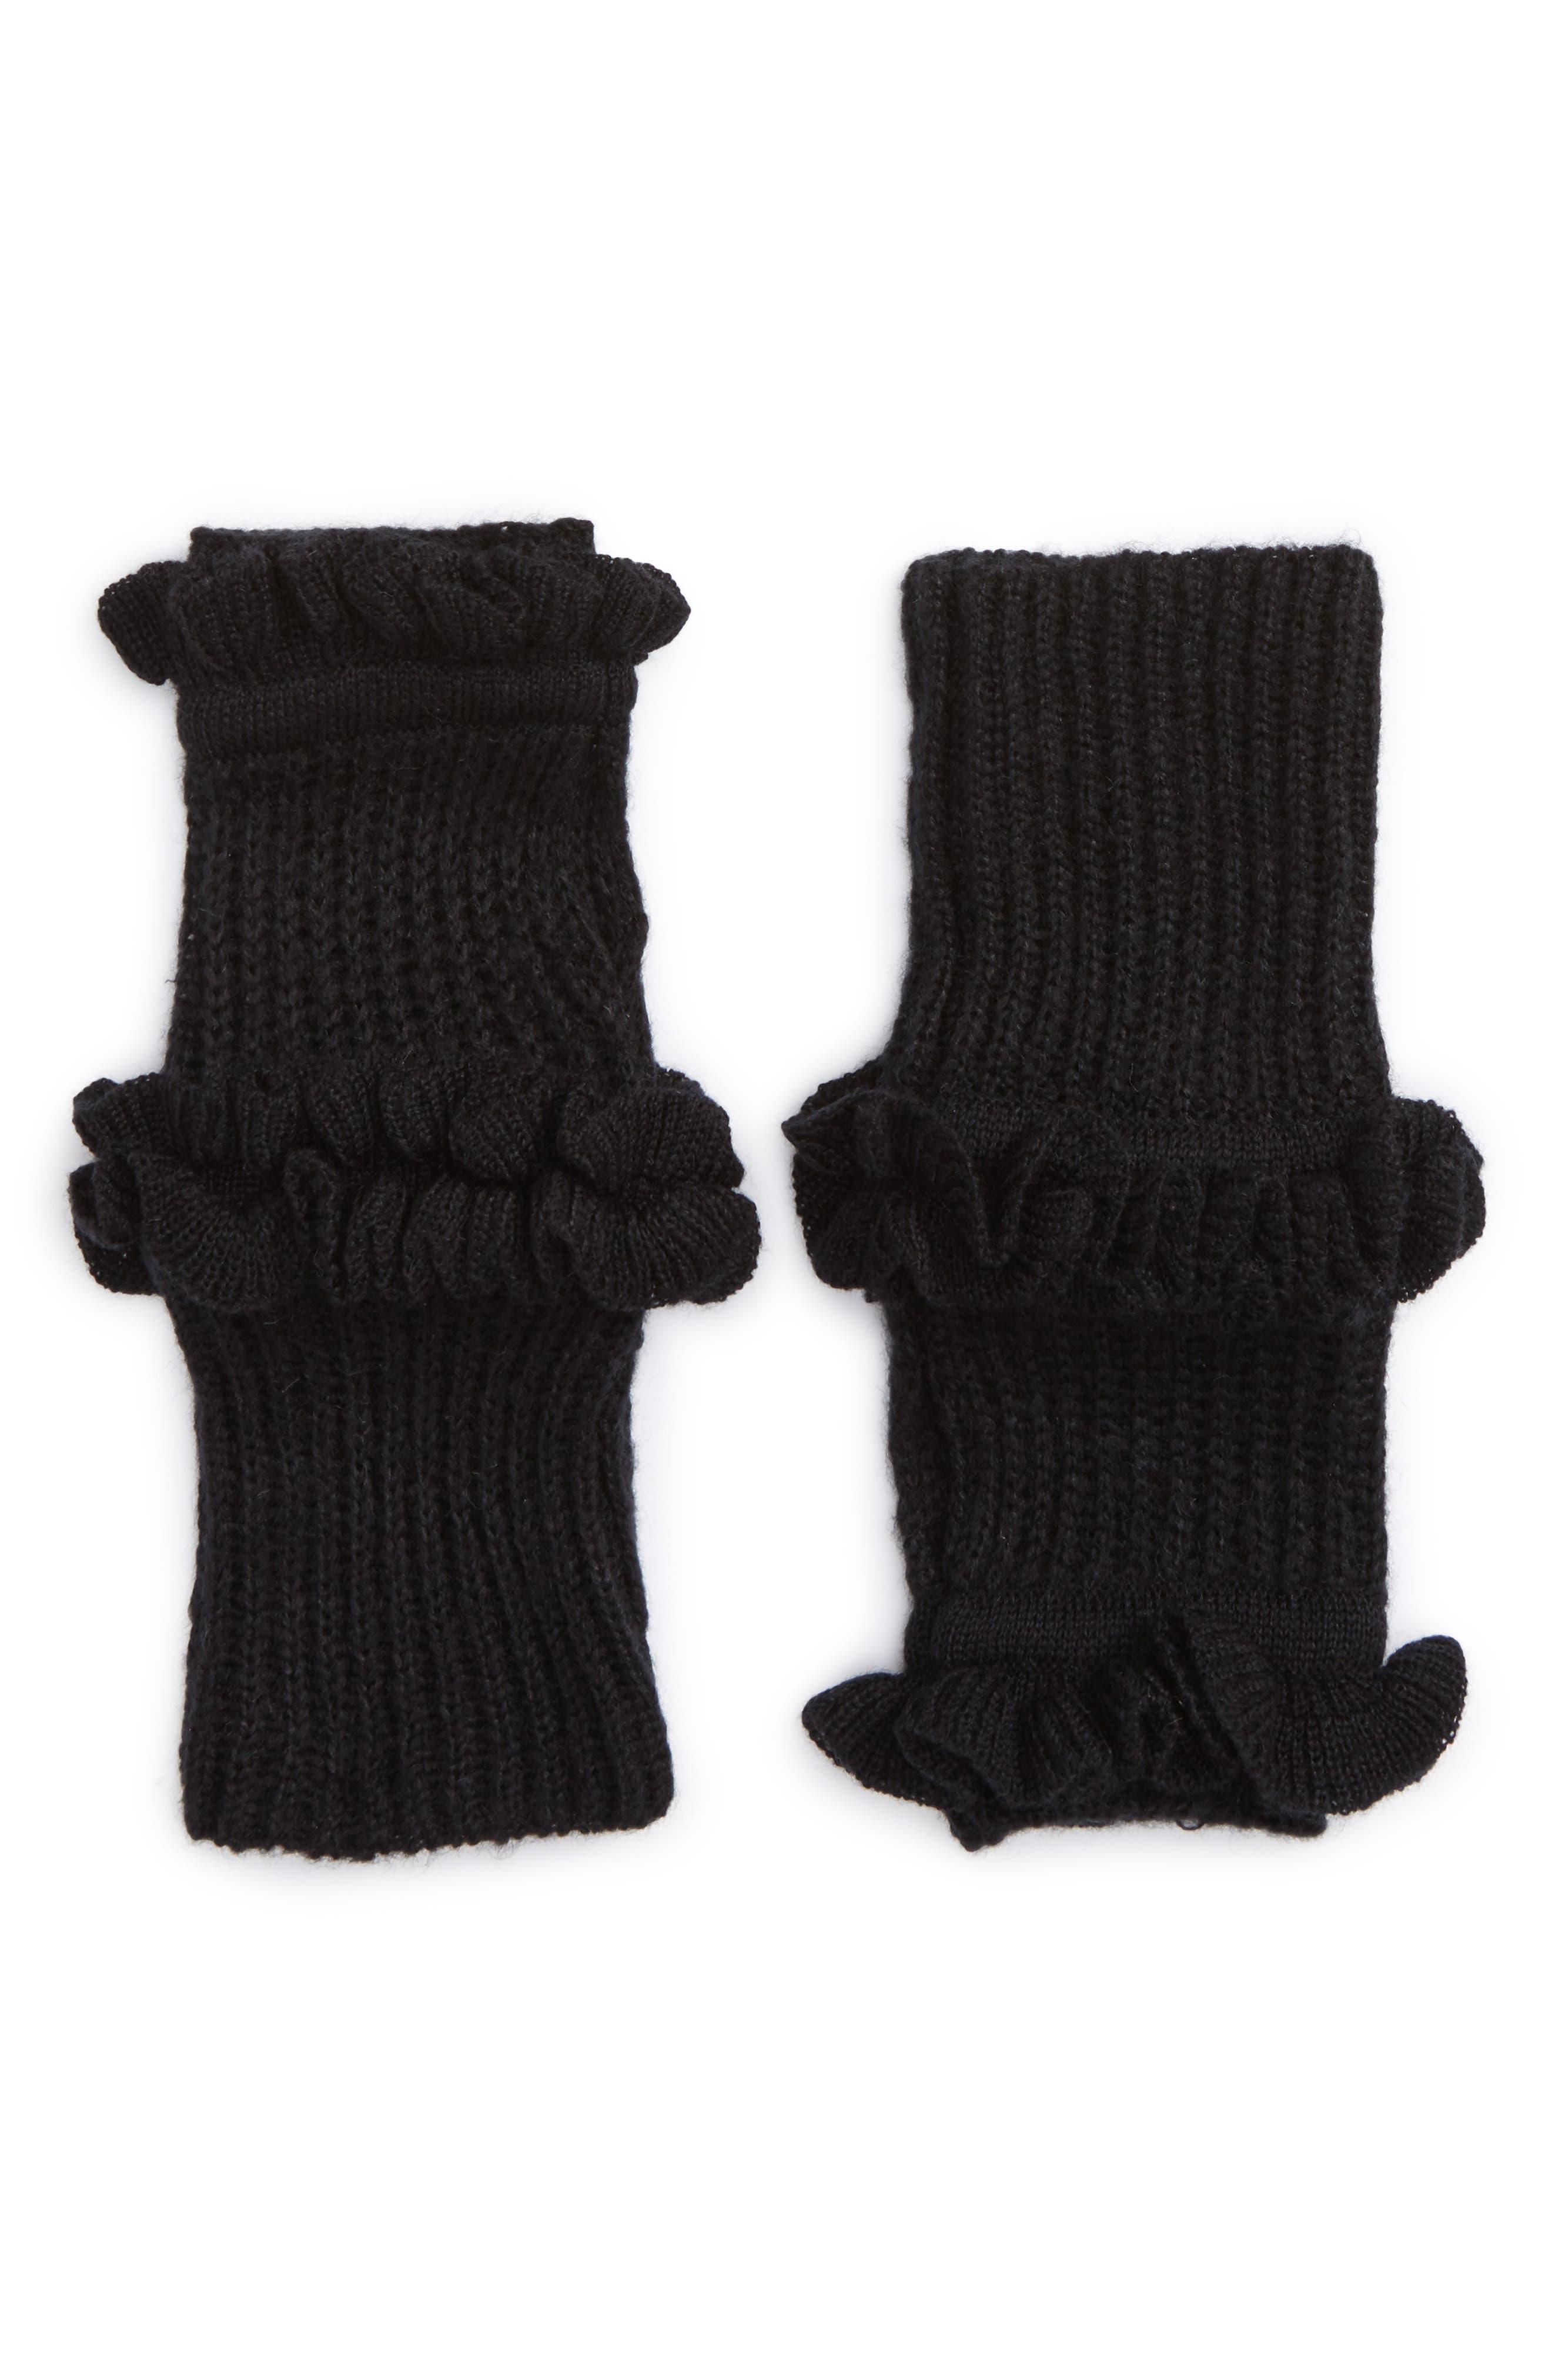 Alternate Image 1 Selected - Rebecca Minkoff Ruffle Fingerless Gloves